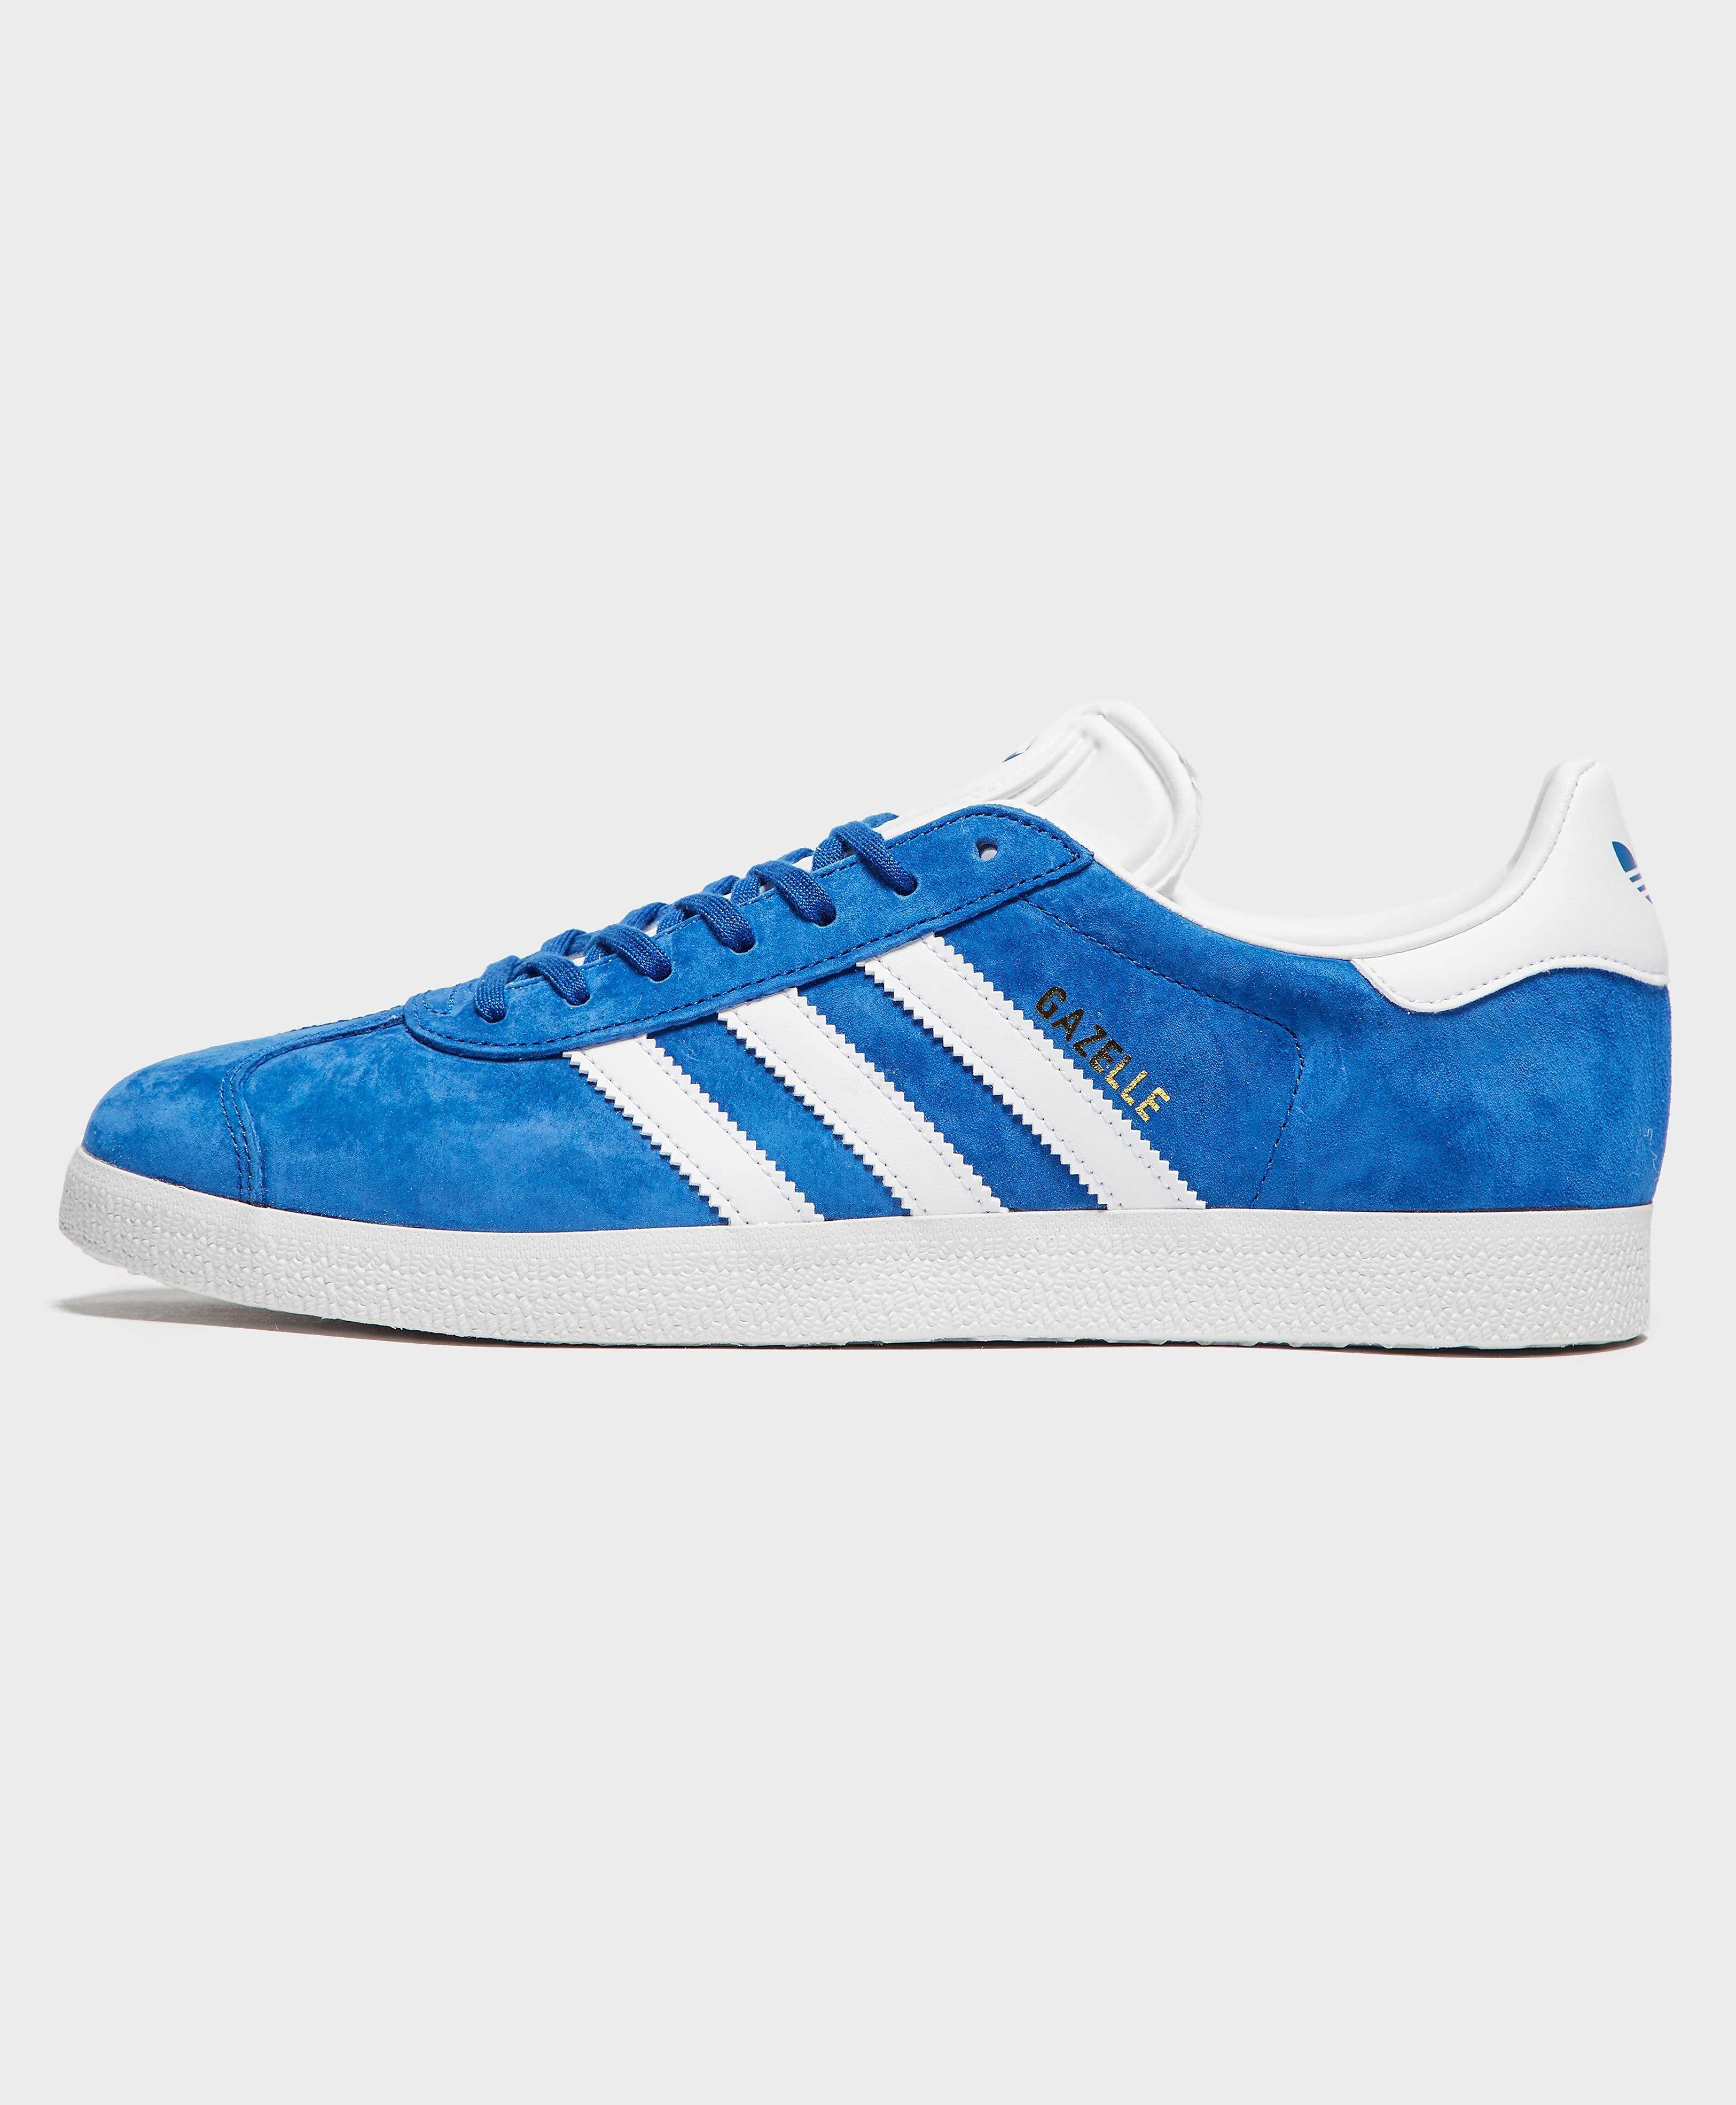 adidas Originals Gazelle  Blue White Blue White